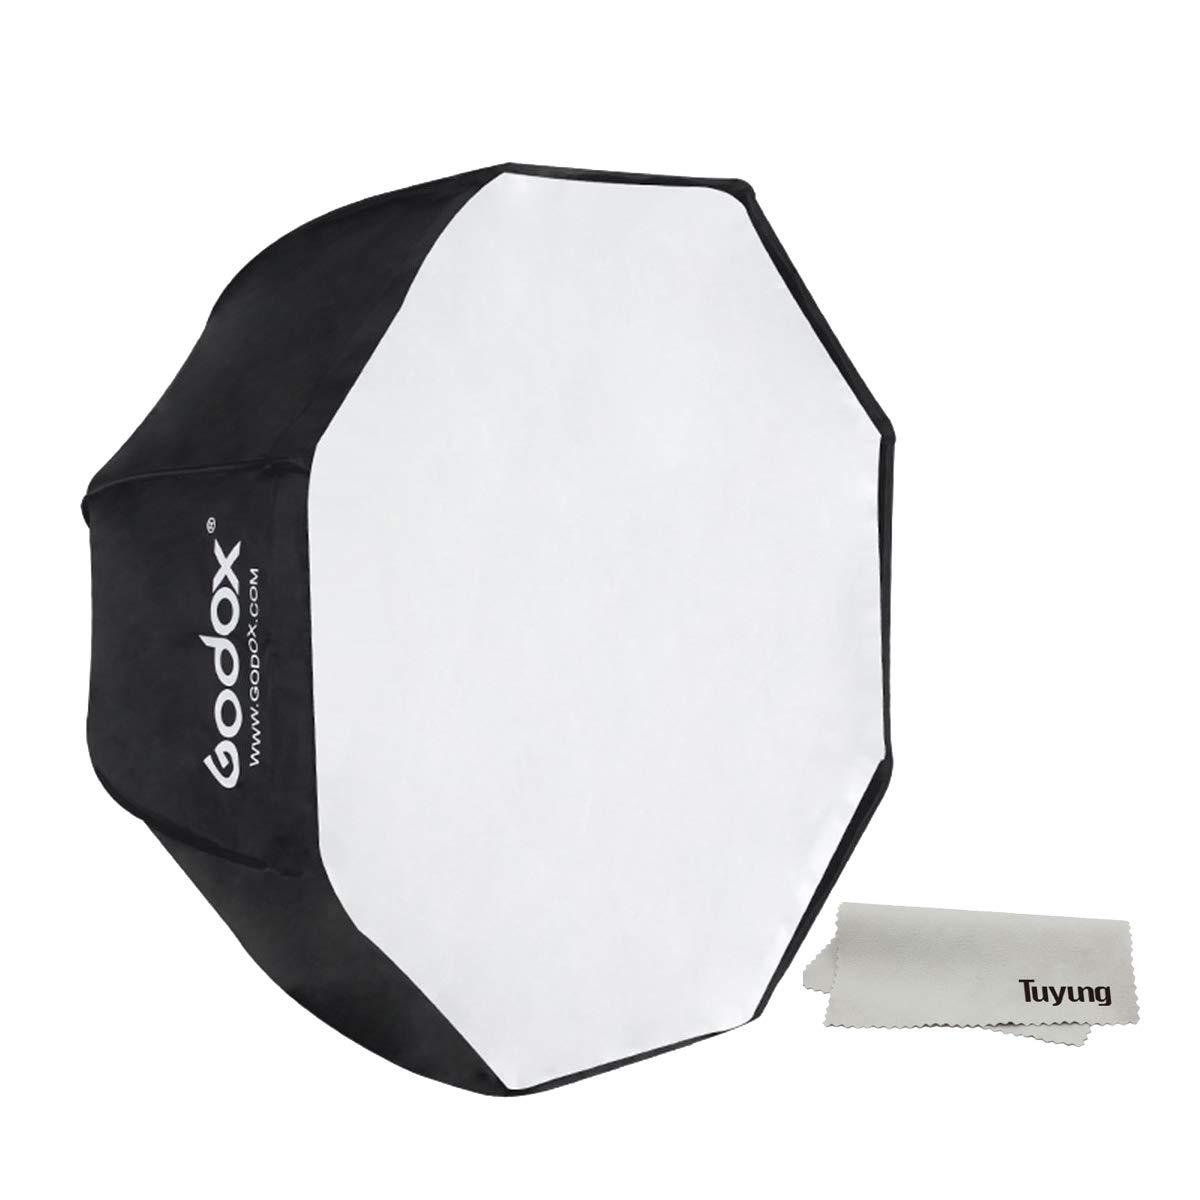 Godox Portable 120cm/47.2'' Umbrella Octagon Softbox Reflector with Carrying Bag for Studio Photo Flash Speedlight by Godox